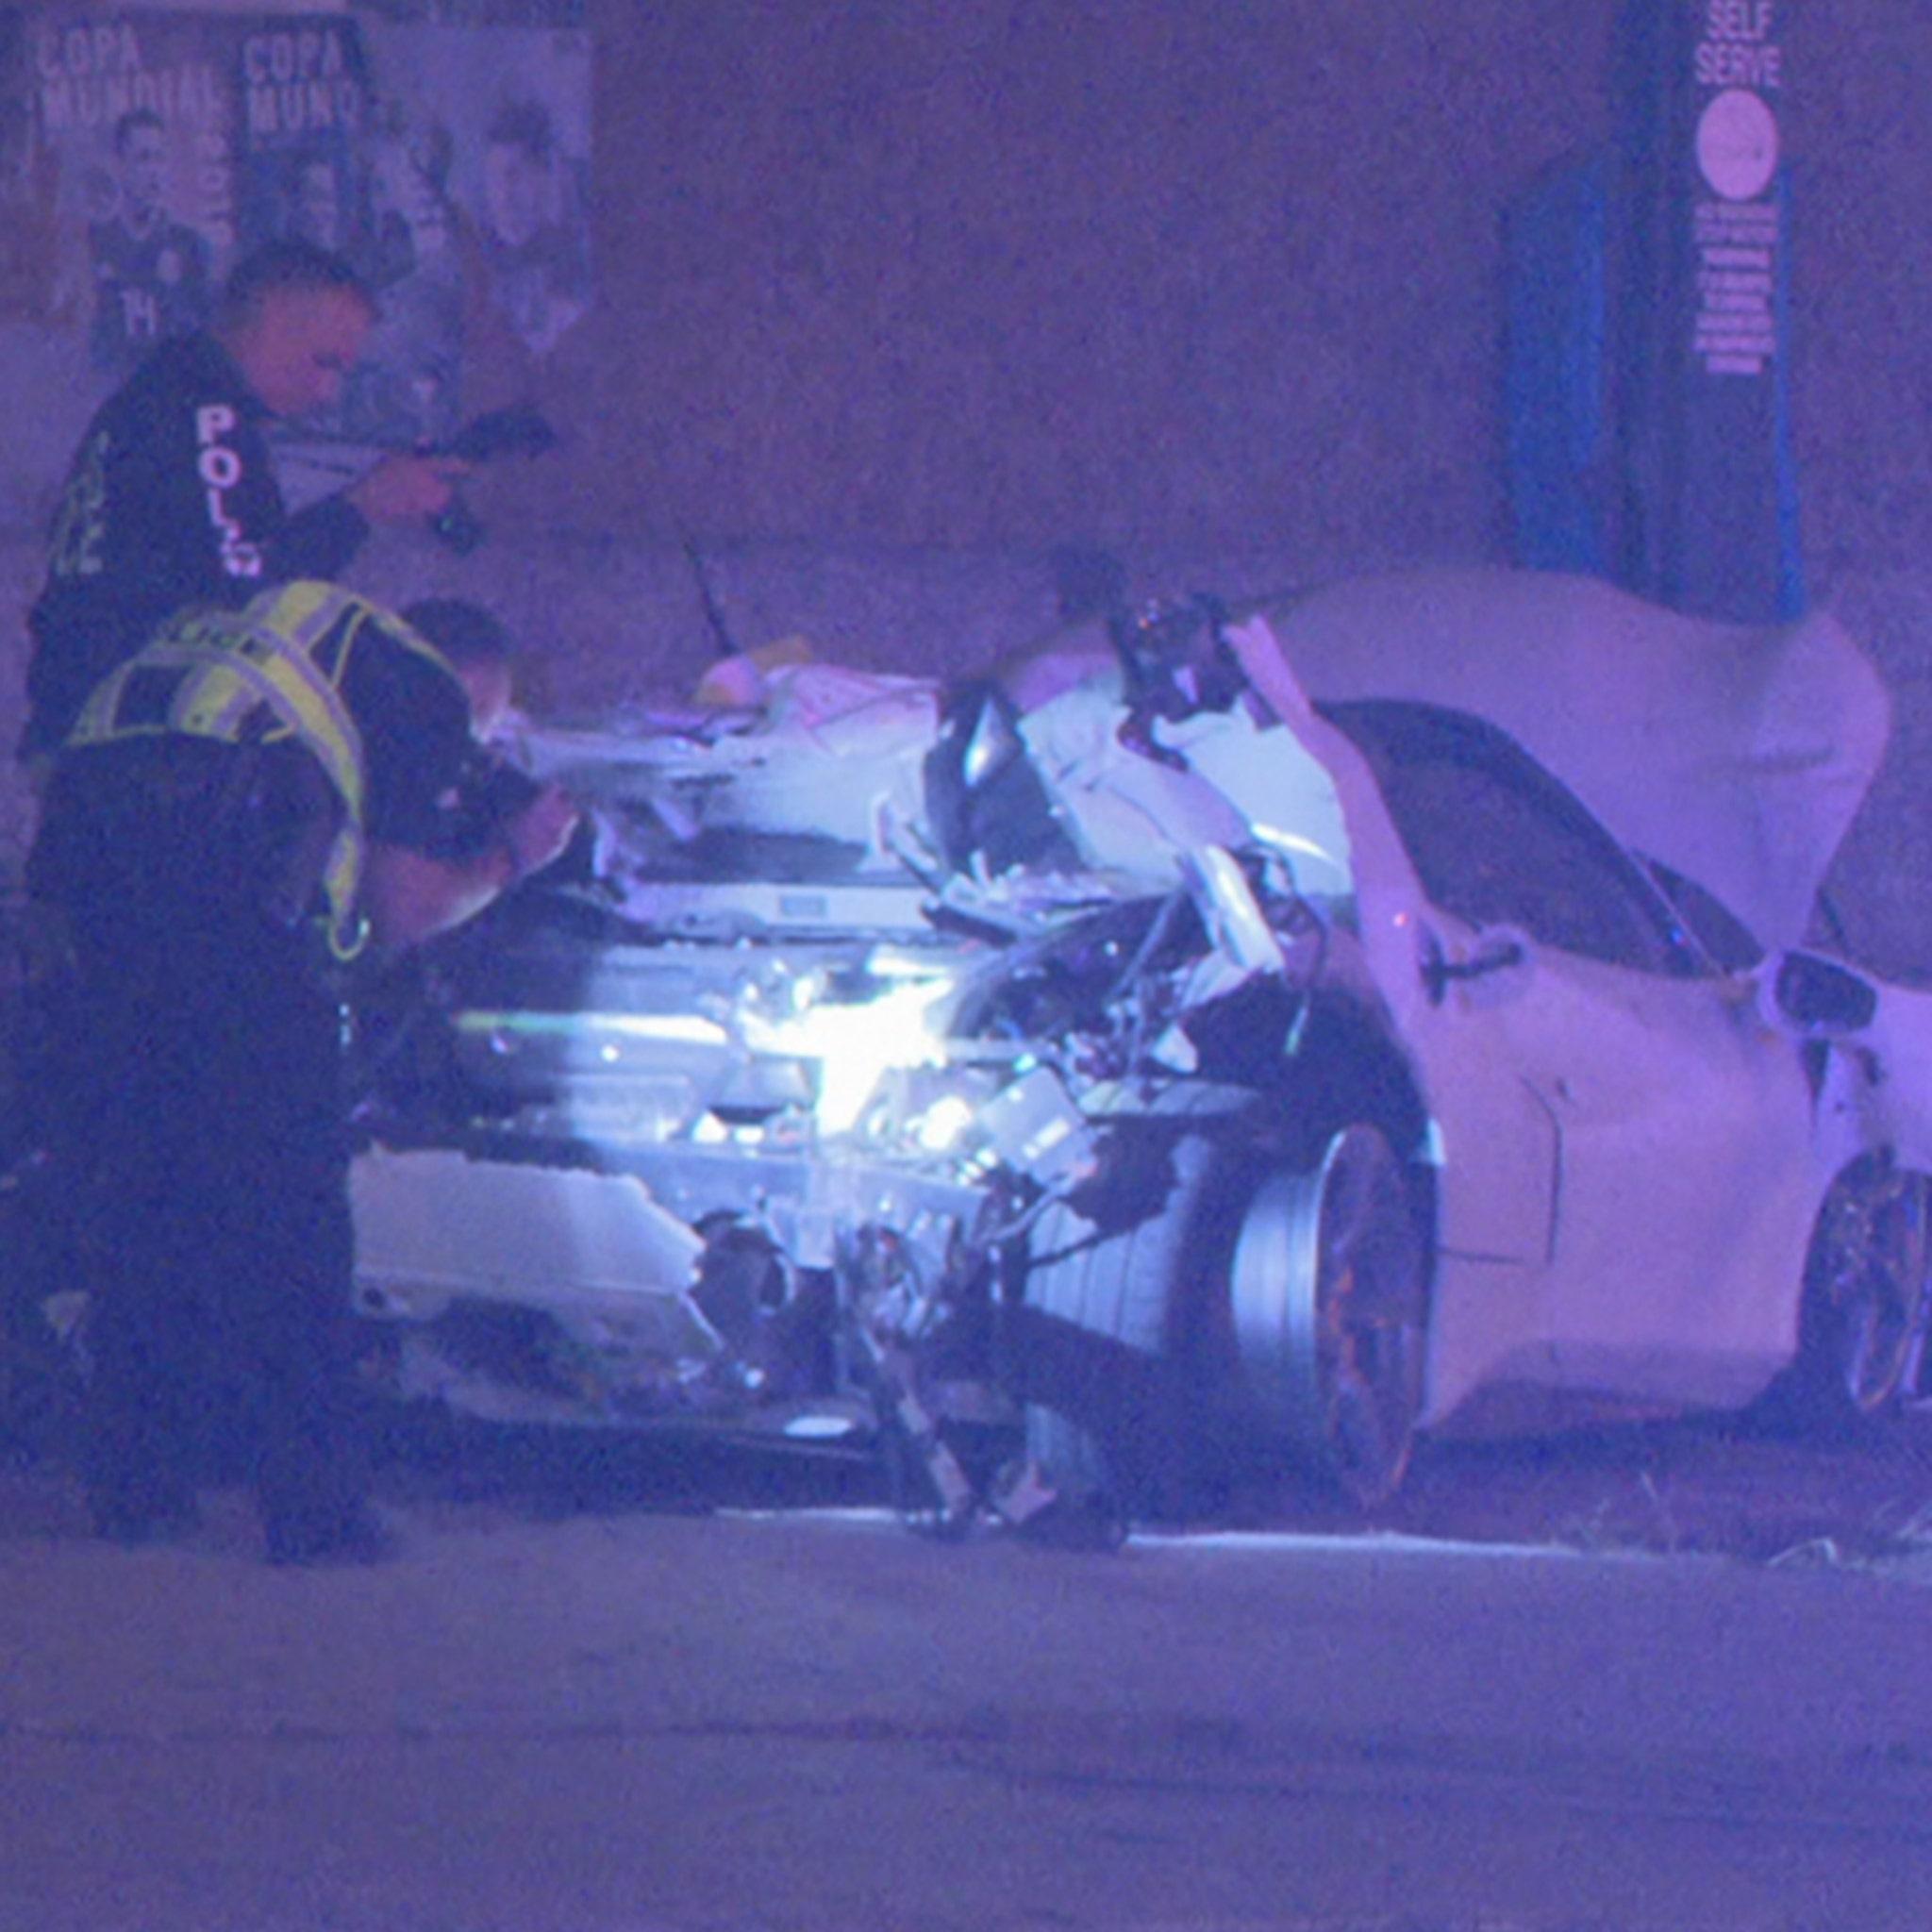 Errol Spence 'Seriously Injured' In Ferrari Crash In Dallas